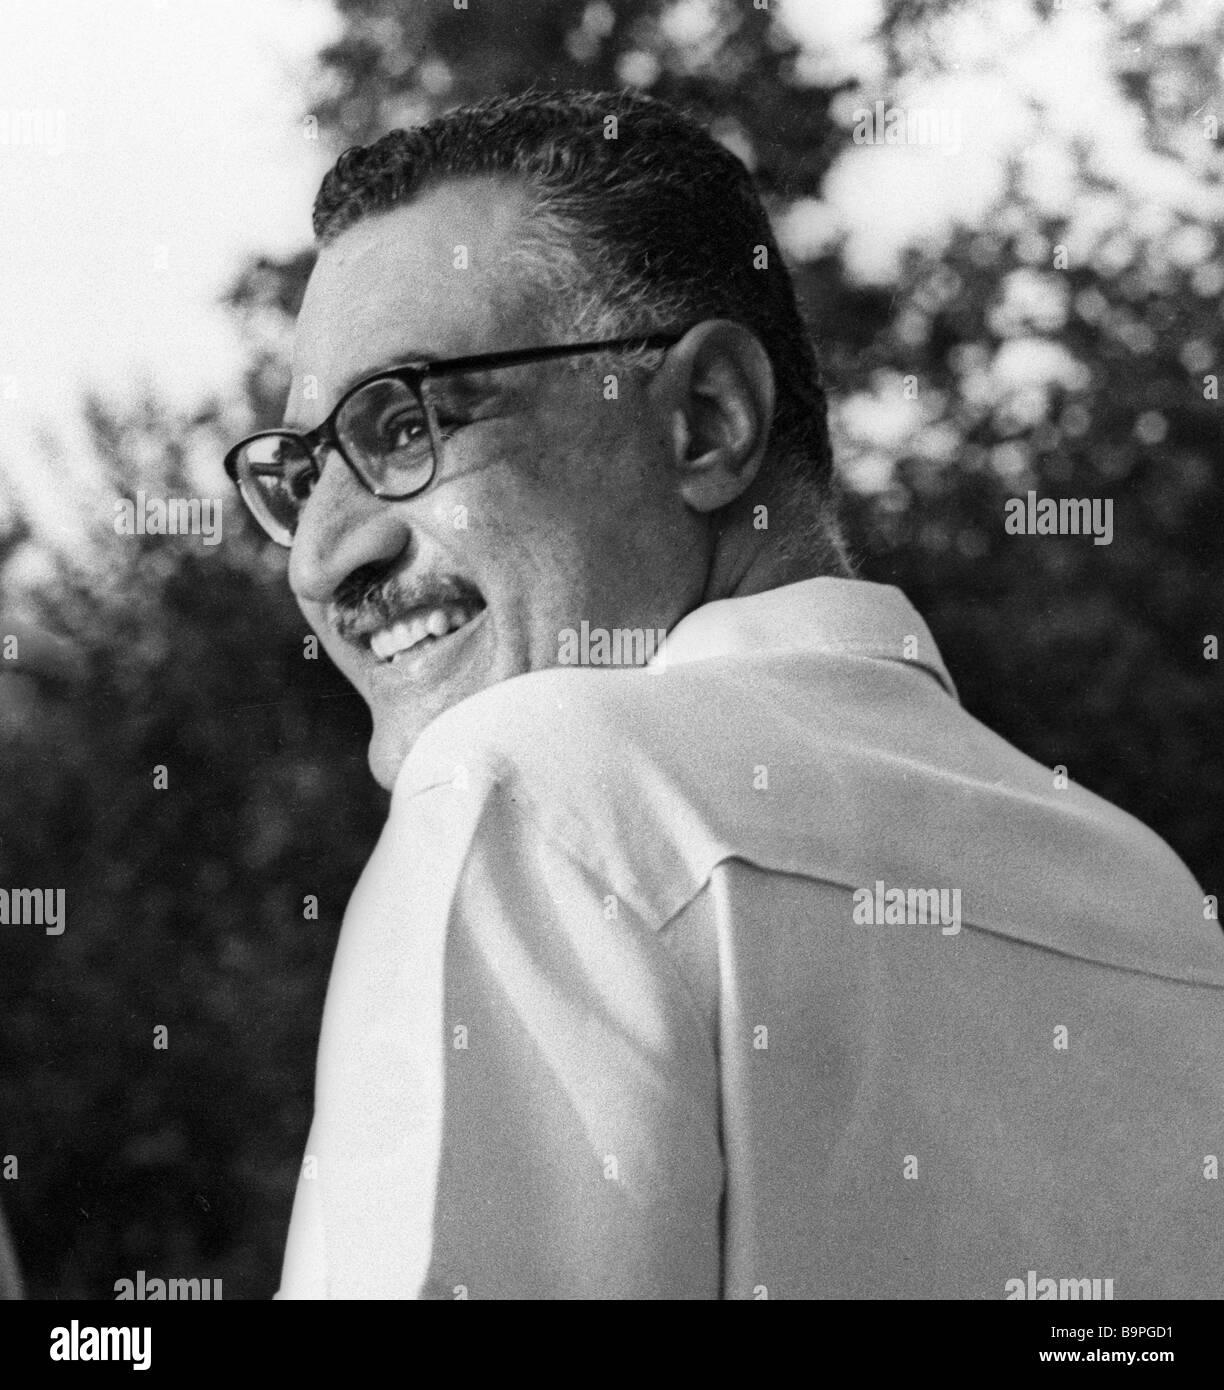 The UAR President Gamal Abdel Naser at rest in Tskhaltubo - Stock Image